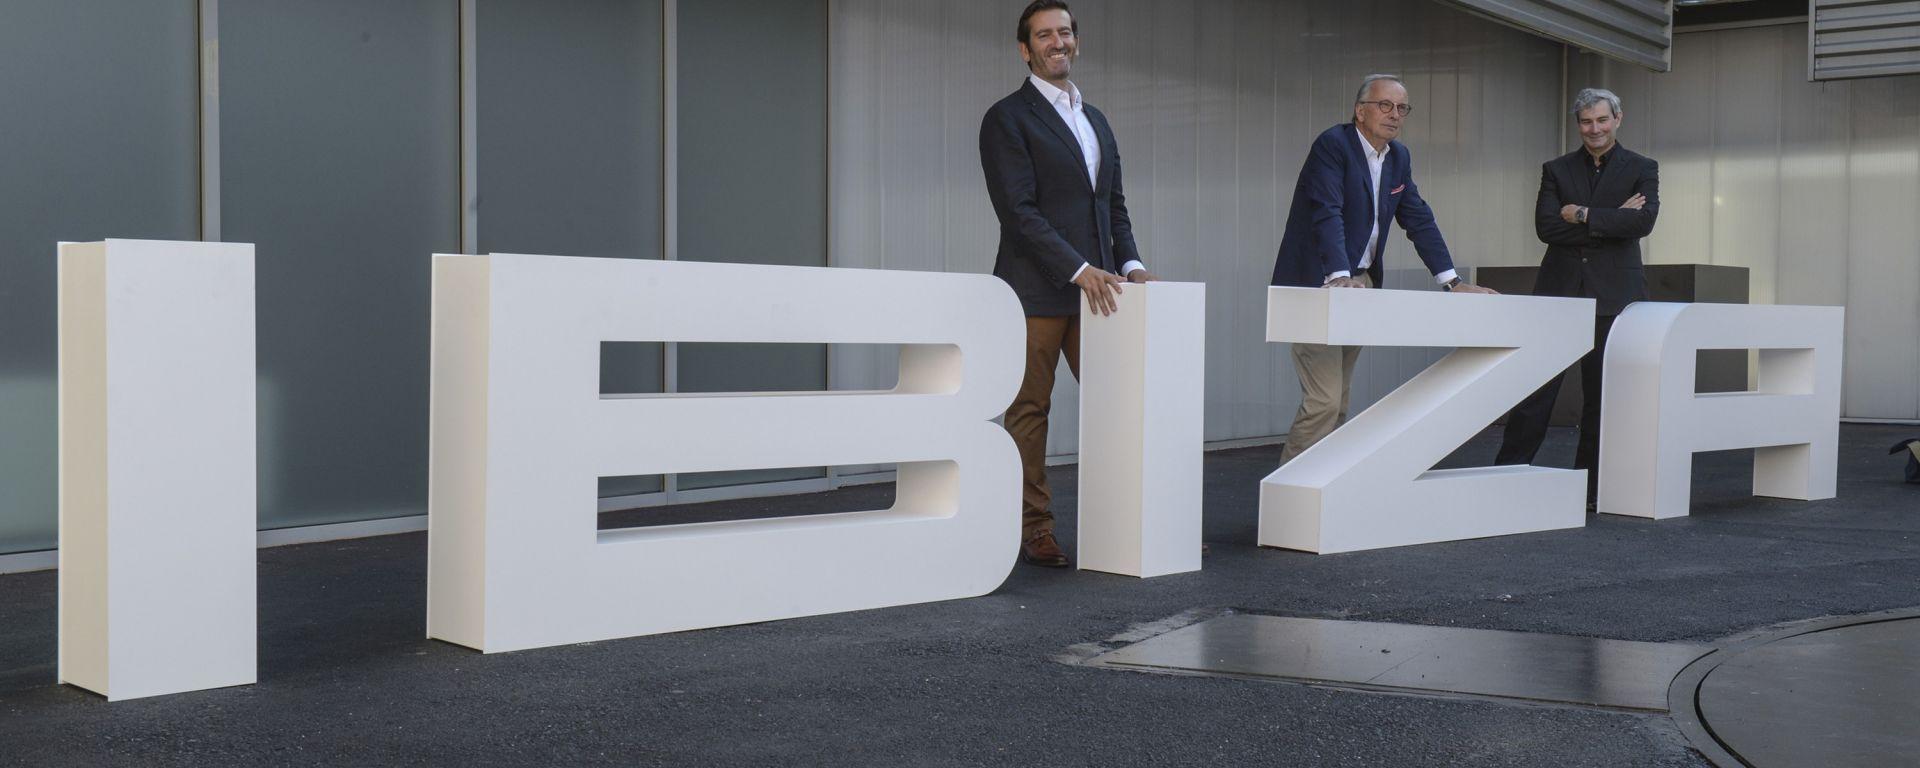 Seat Ibiza Business e Business High